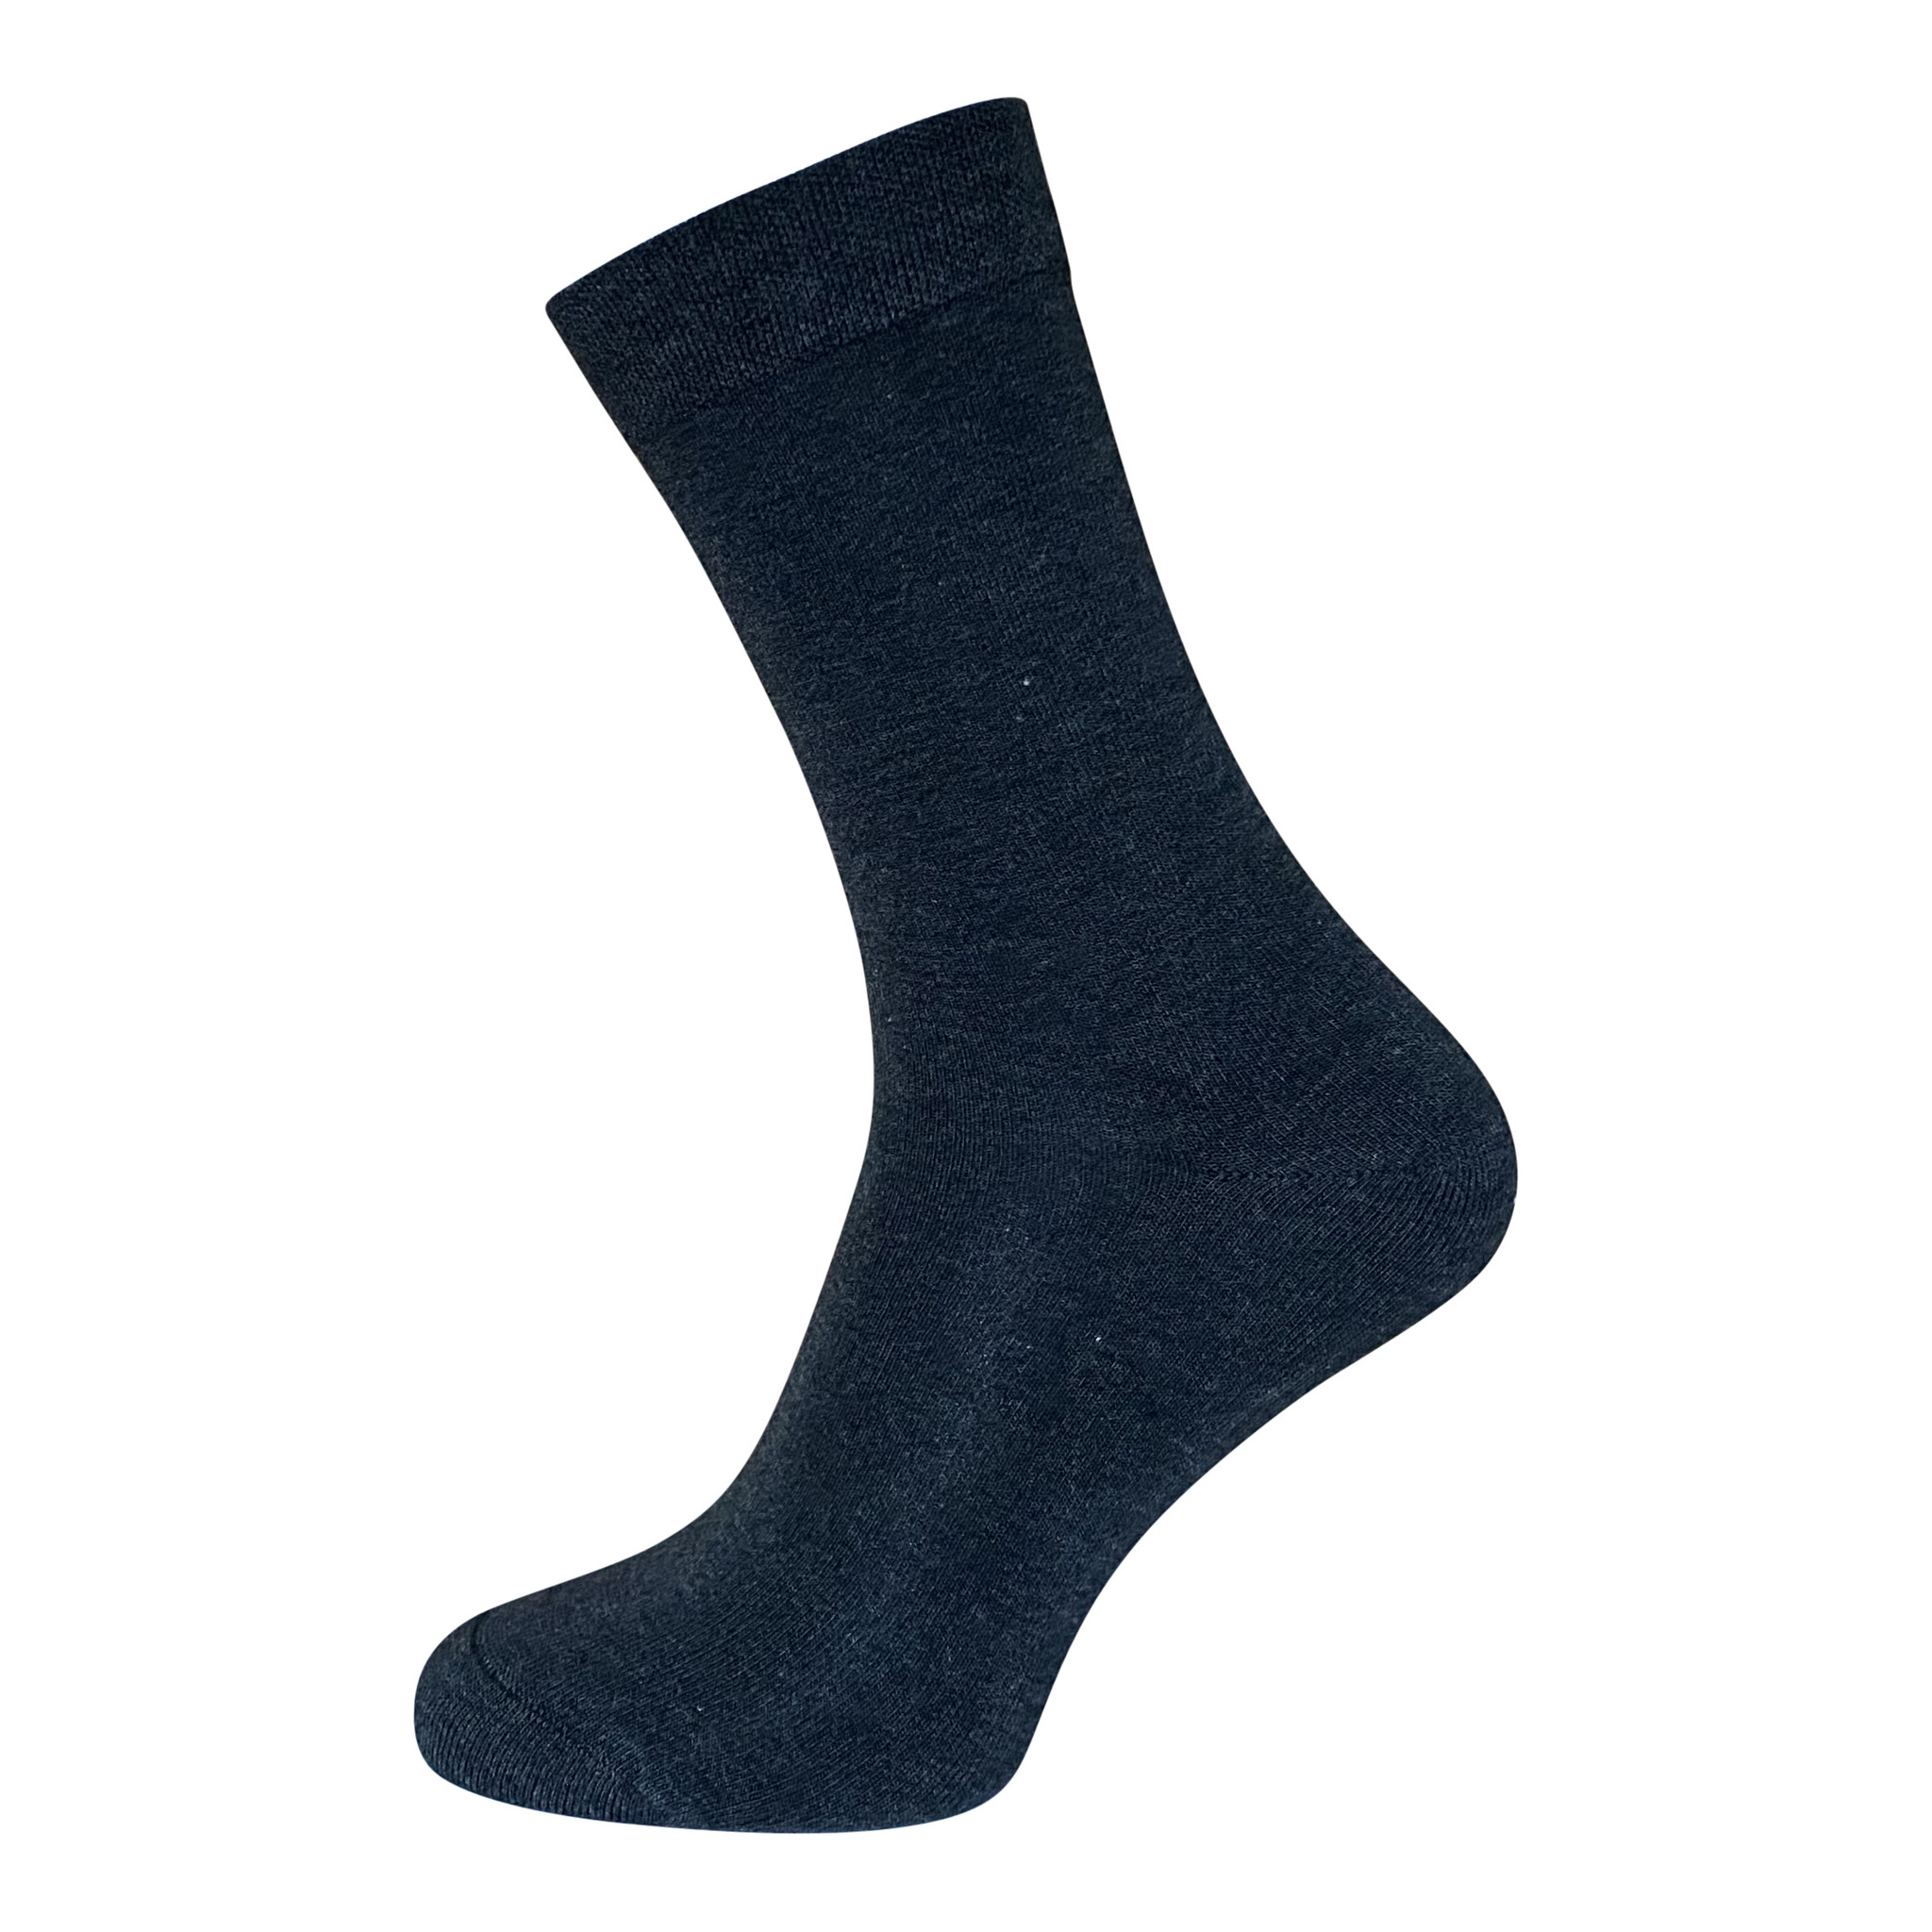 BORU Boru Bamboe sokken - antraciet